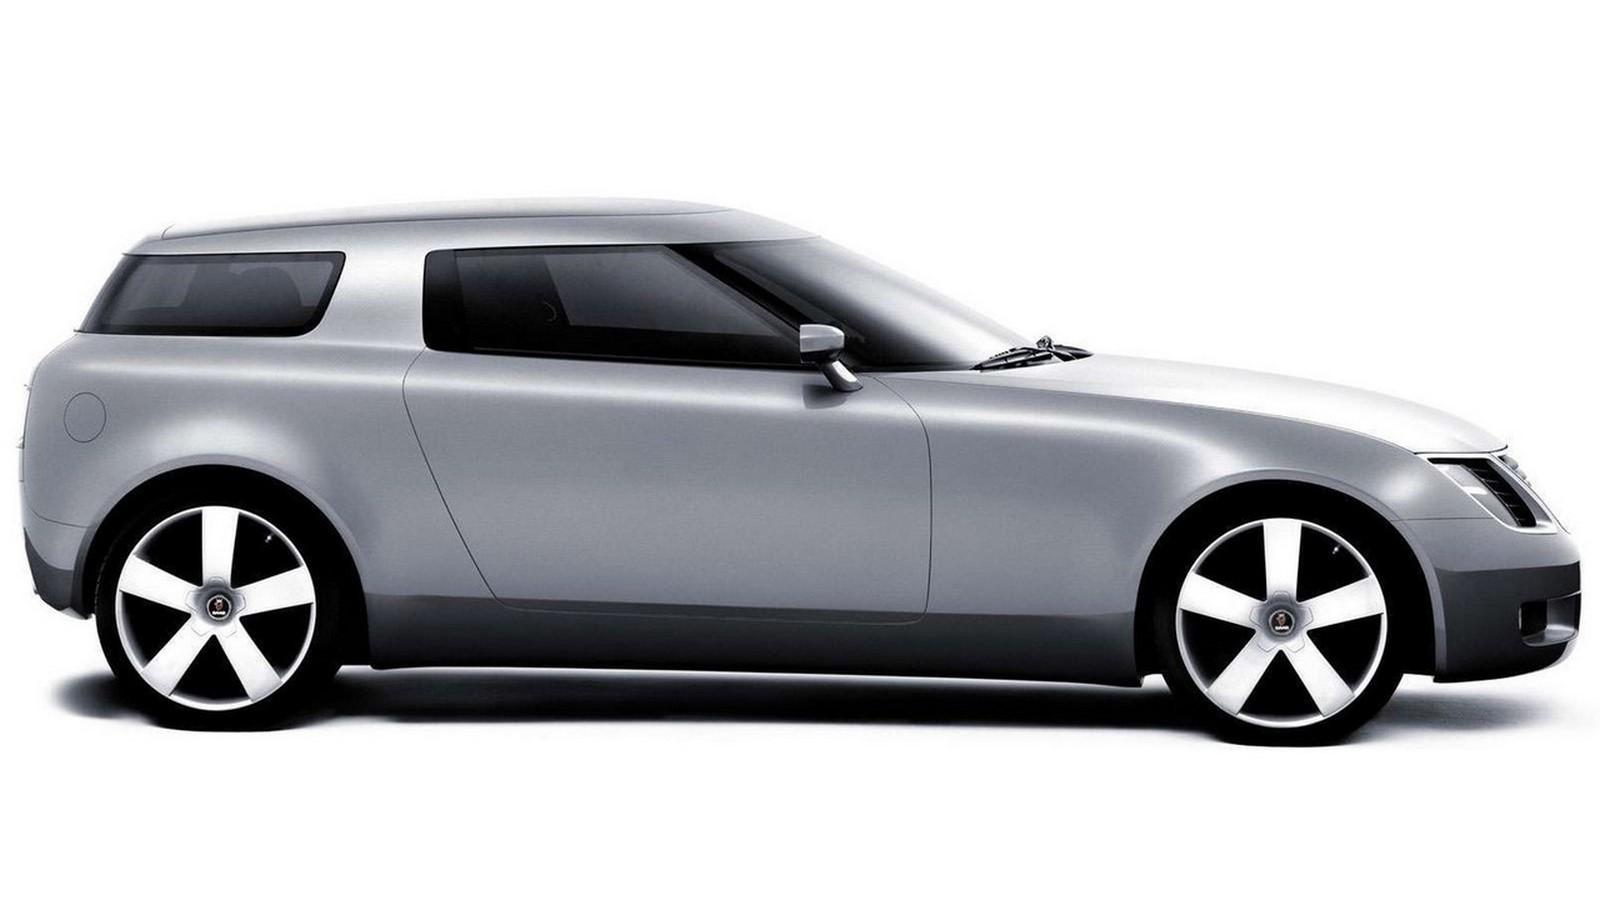 2001-saab-9x-concept (15)